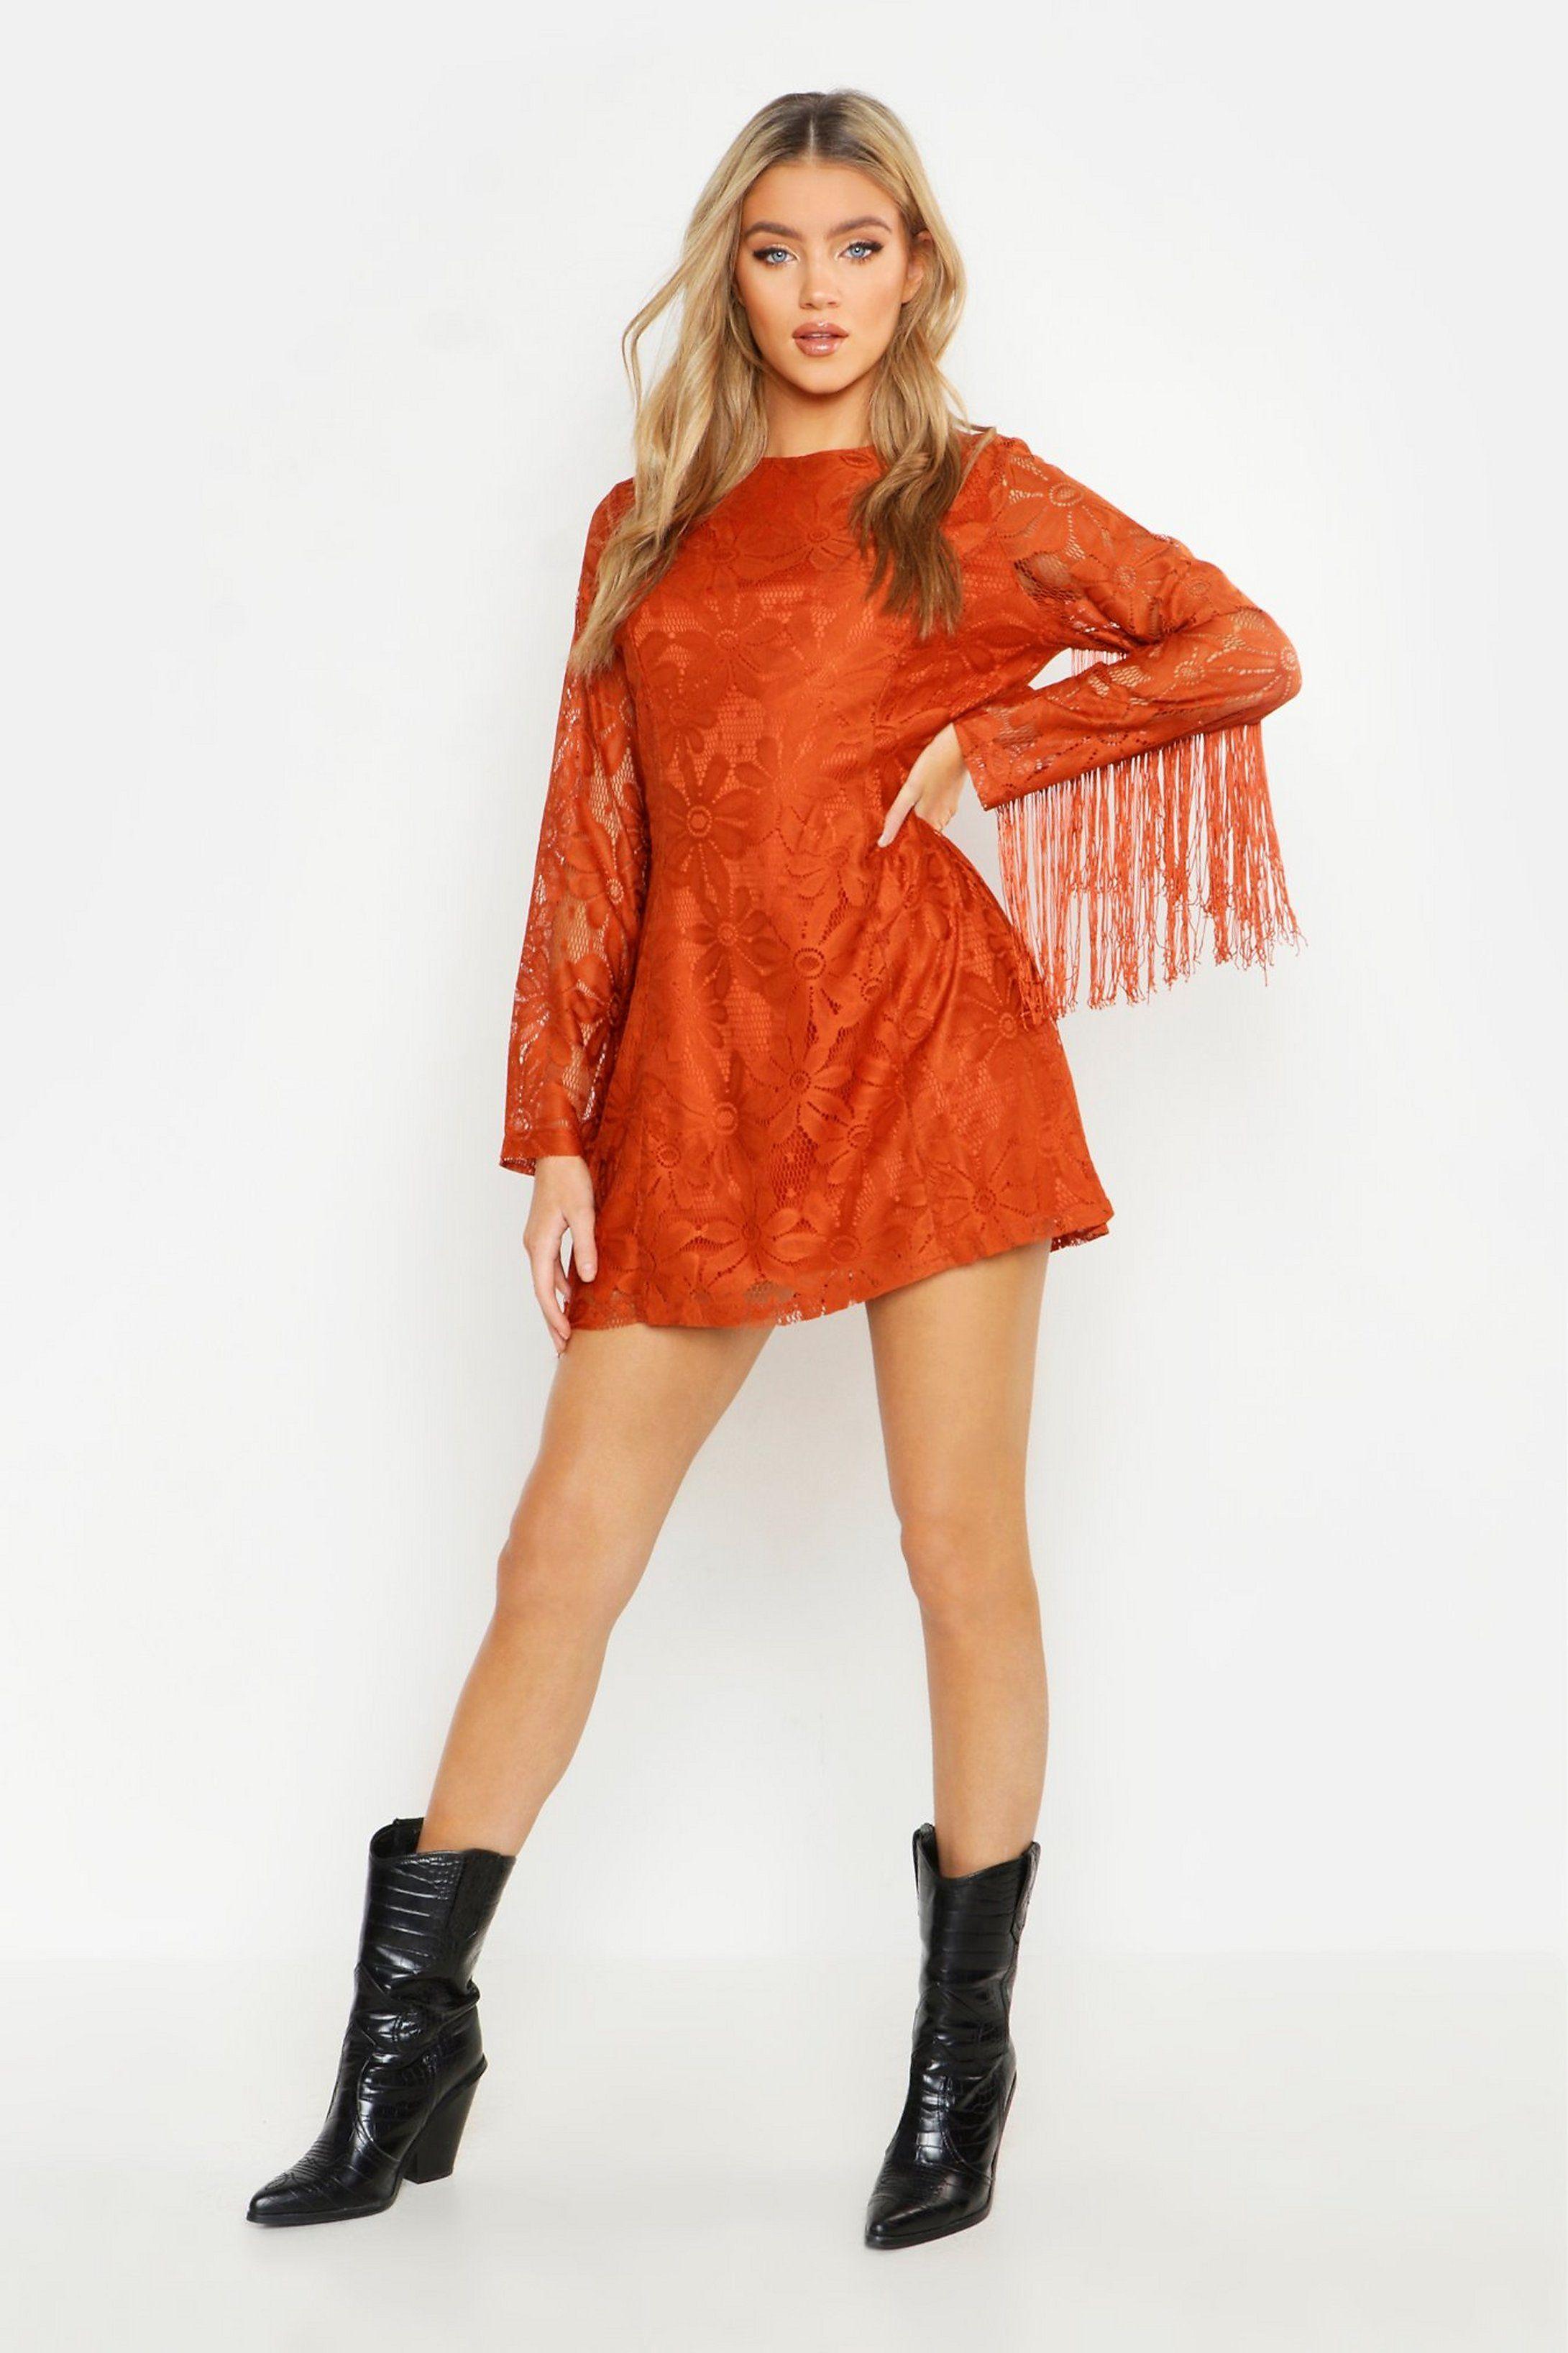 Tassel Sleeve Lace Shift Dress boohoo Bodycon fashion